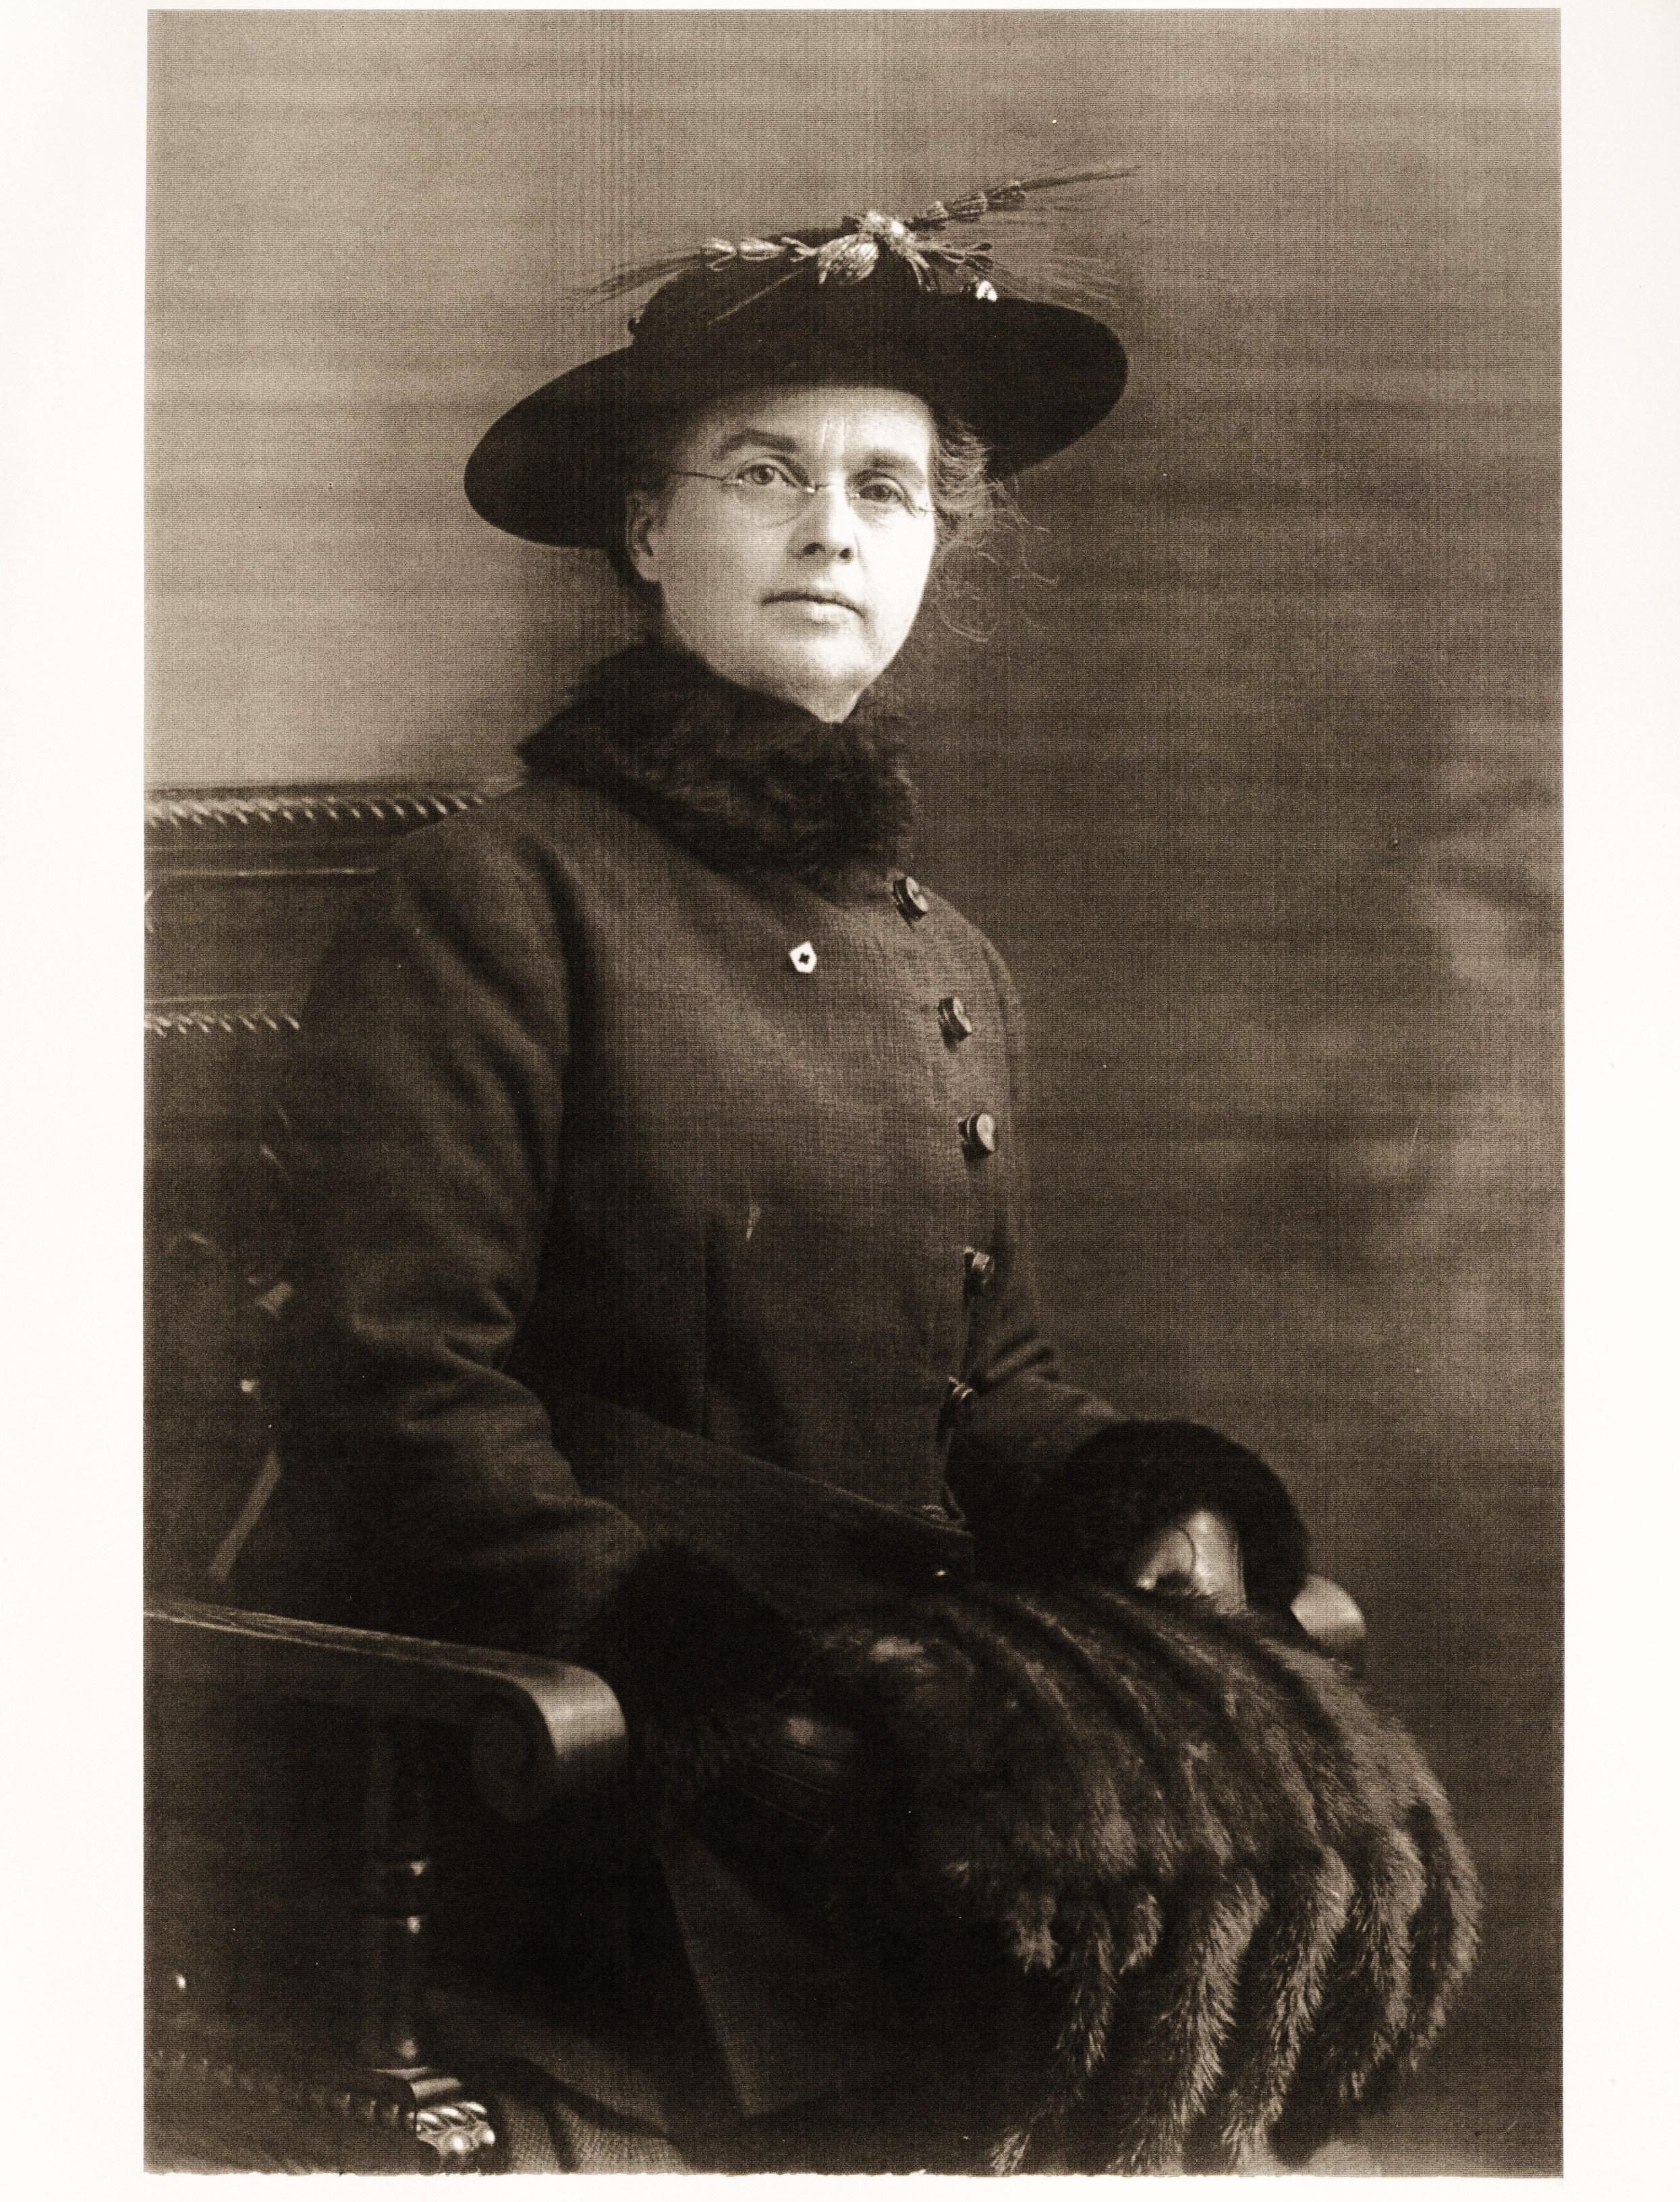 Mrs. Charles (cora) Bleecker